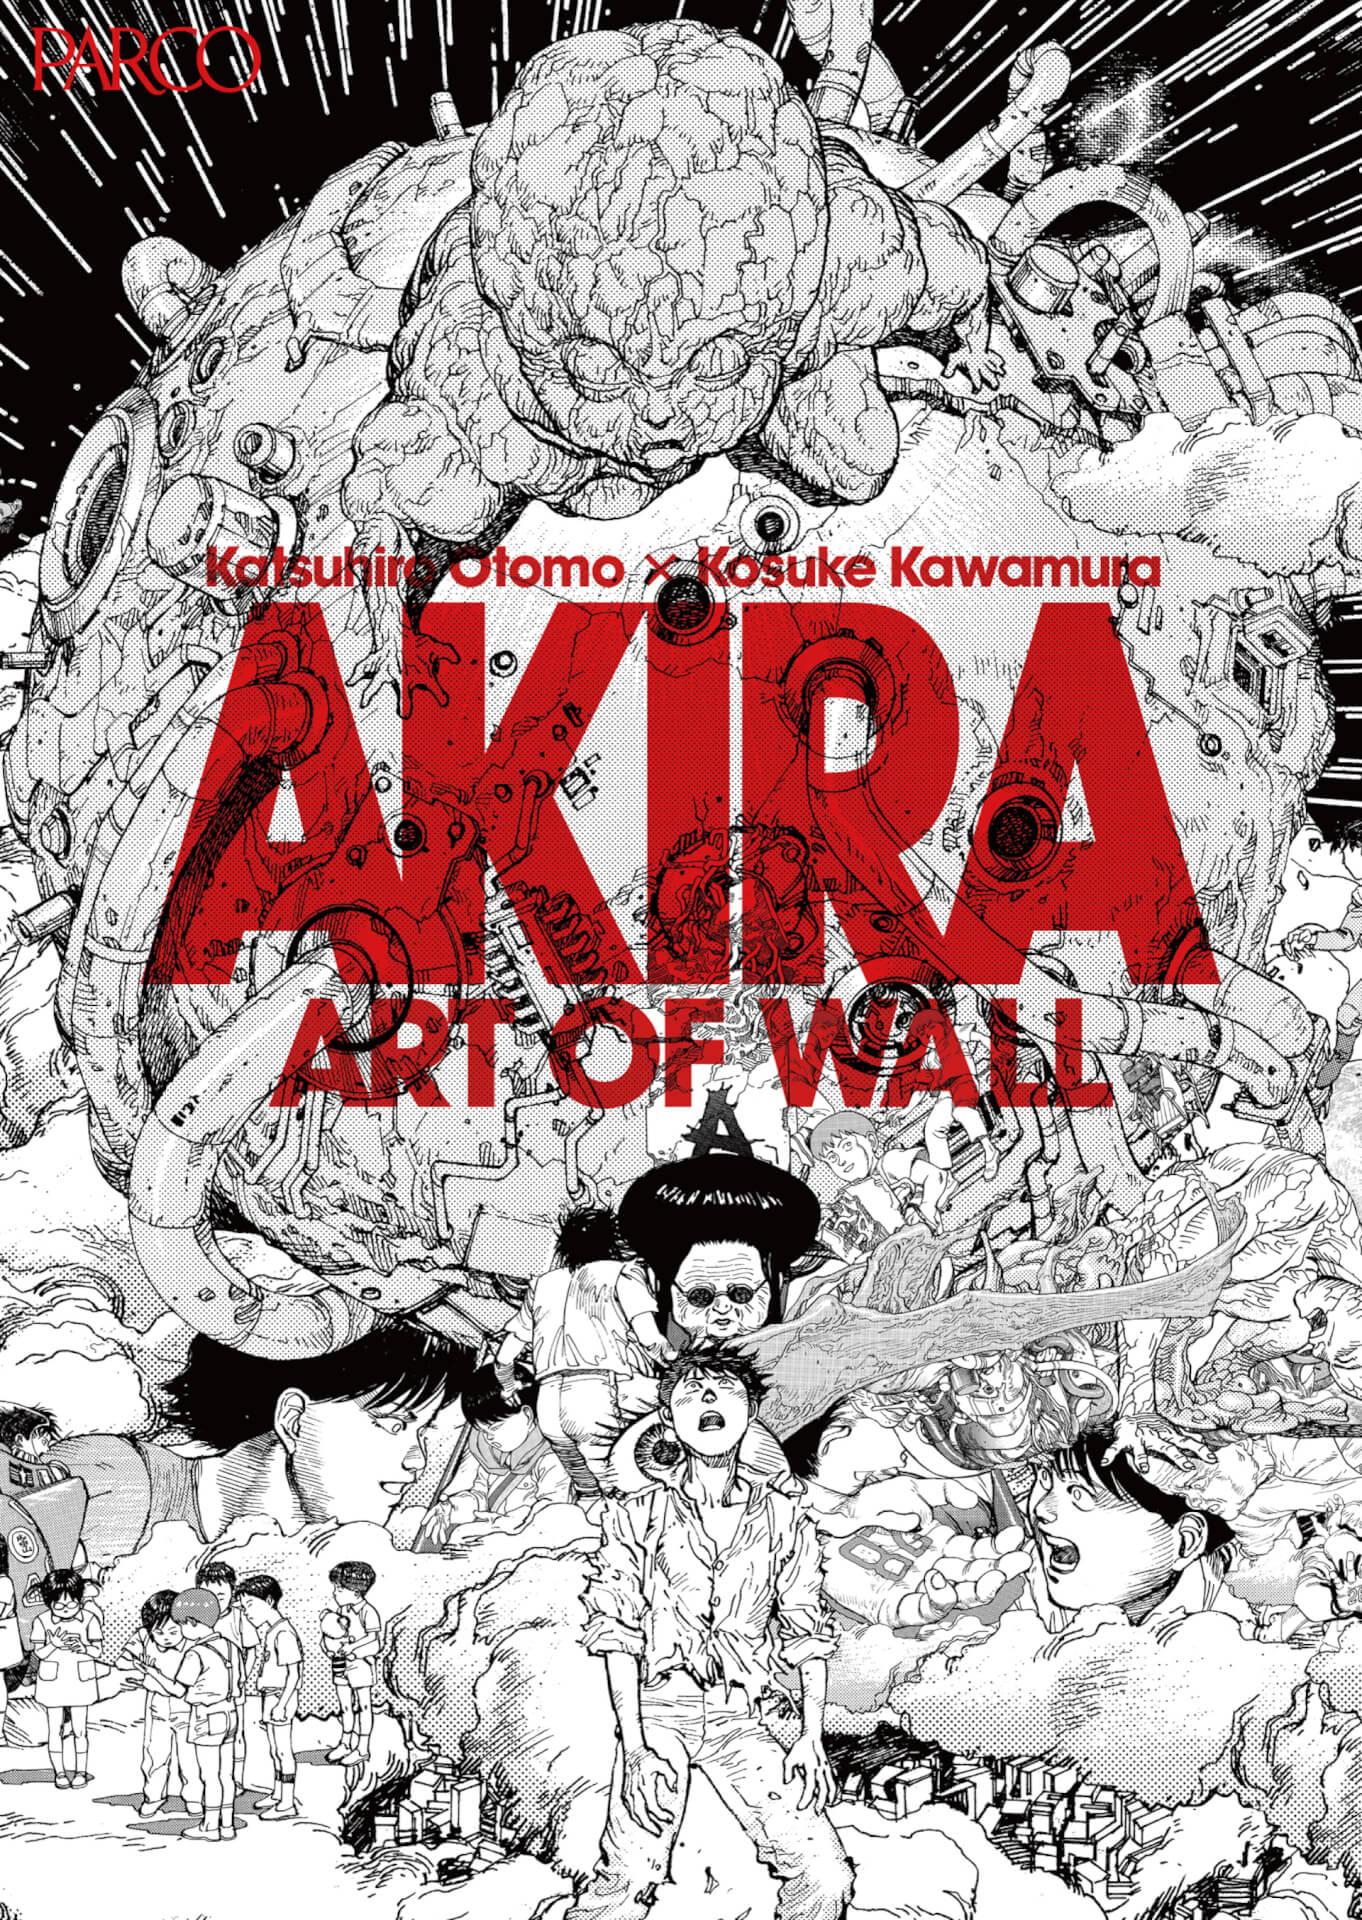 <AKIRA ART OF WALL>、PARCO MUSEUM TOKYO&GALLERY Xオープン記念エキシビジョンとして開催決定 art190919_akira_artofwall_1